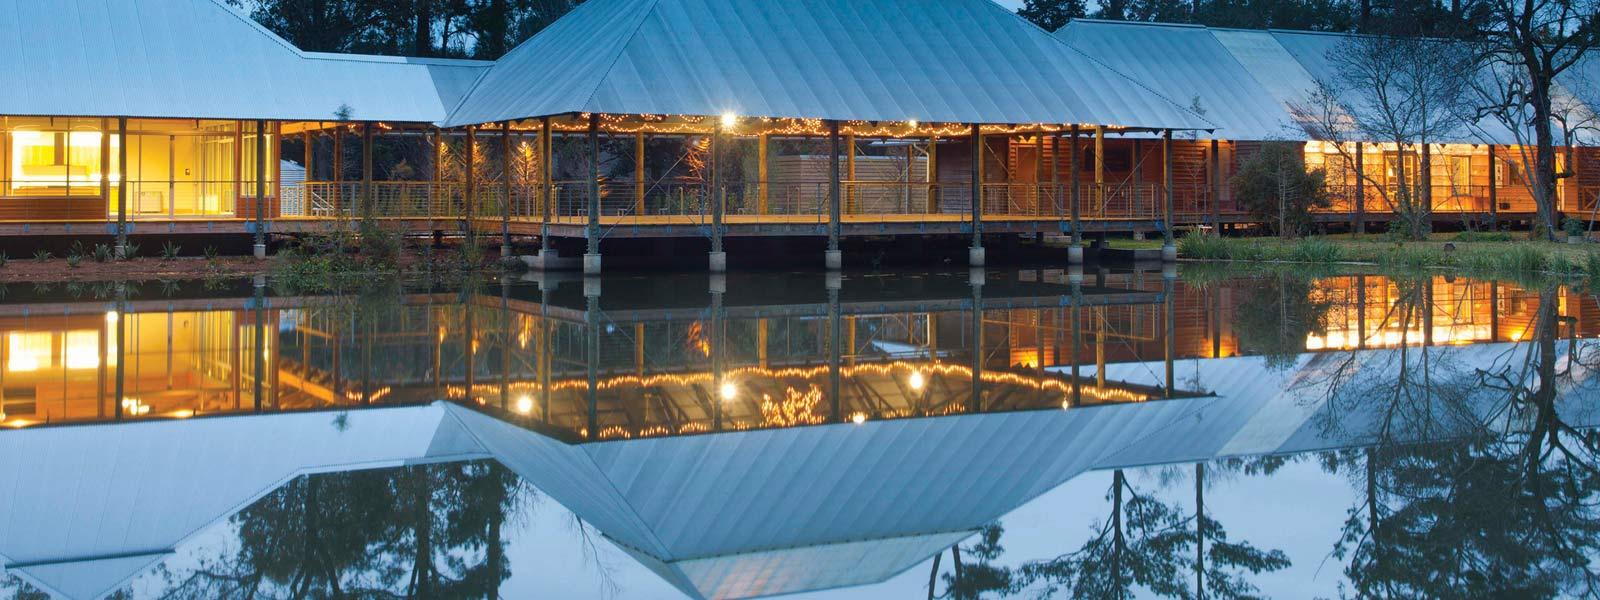 LSU Hilltop Arboretum at twilight, illuminated building reflected on pond water